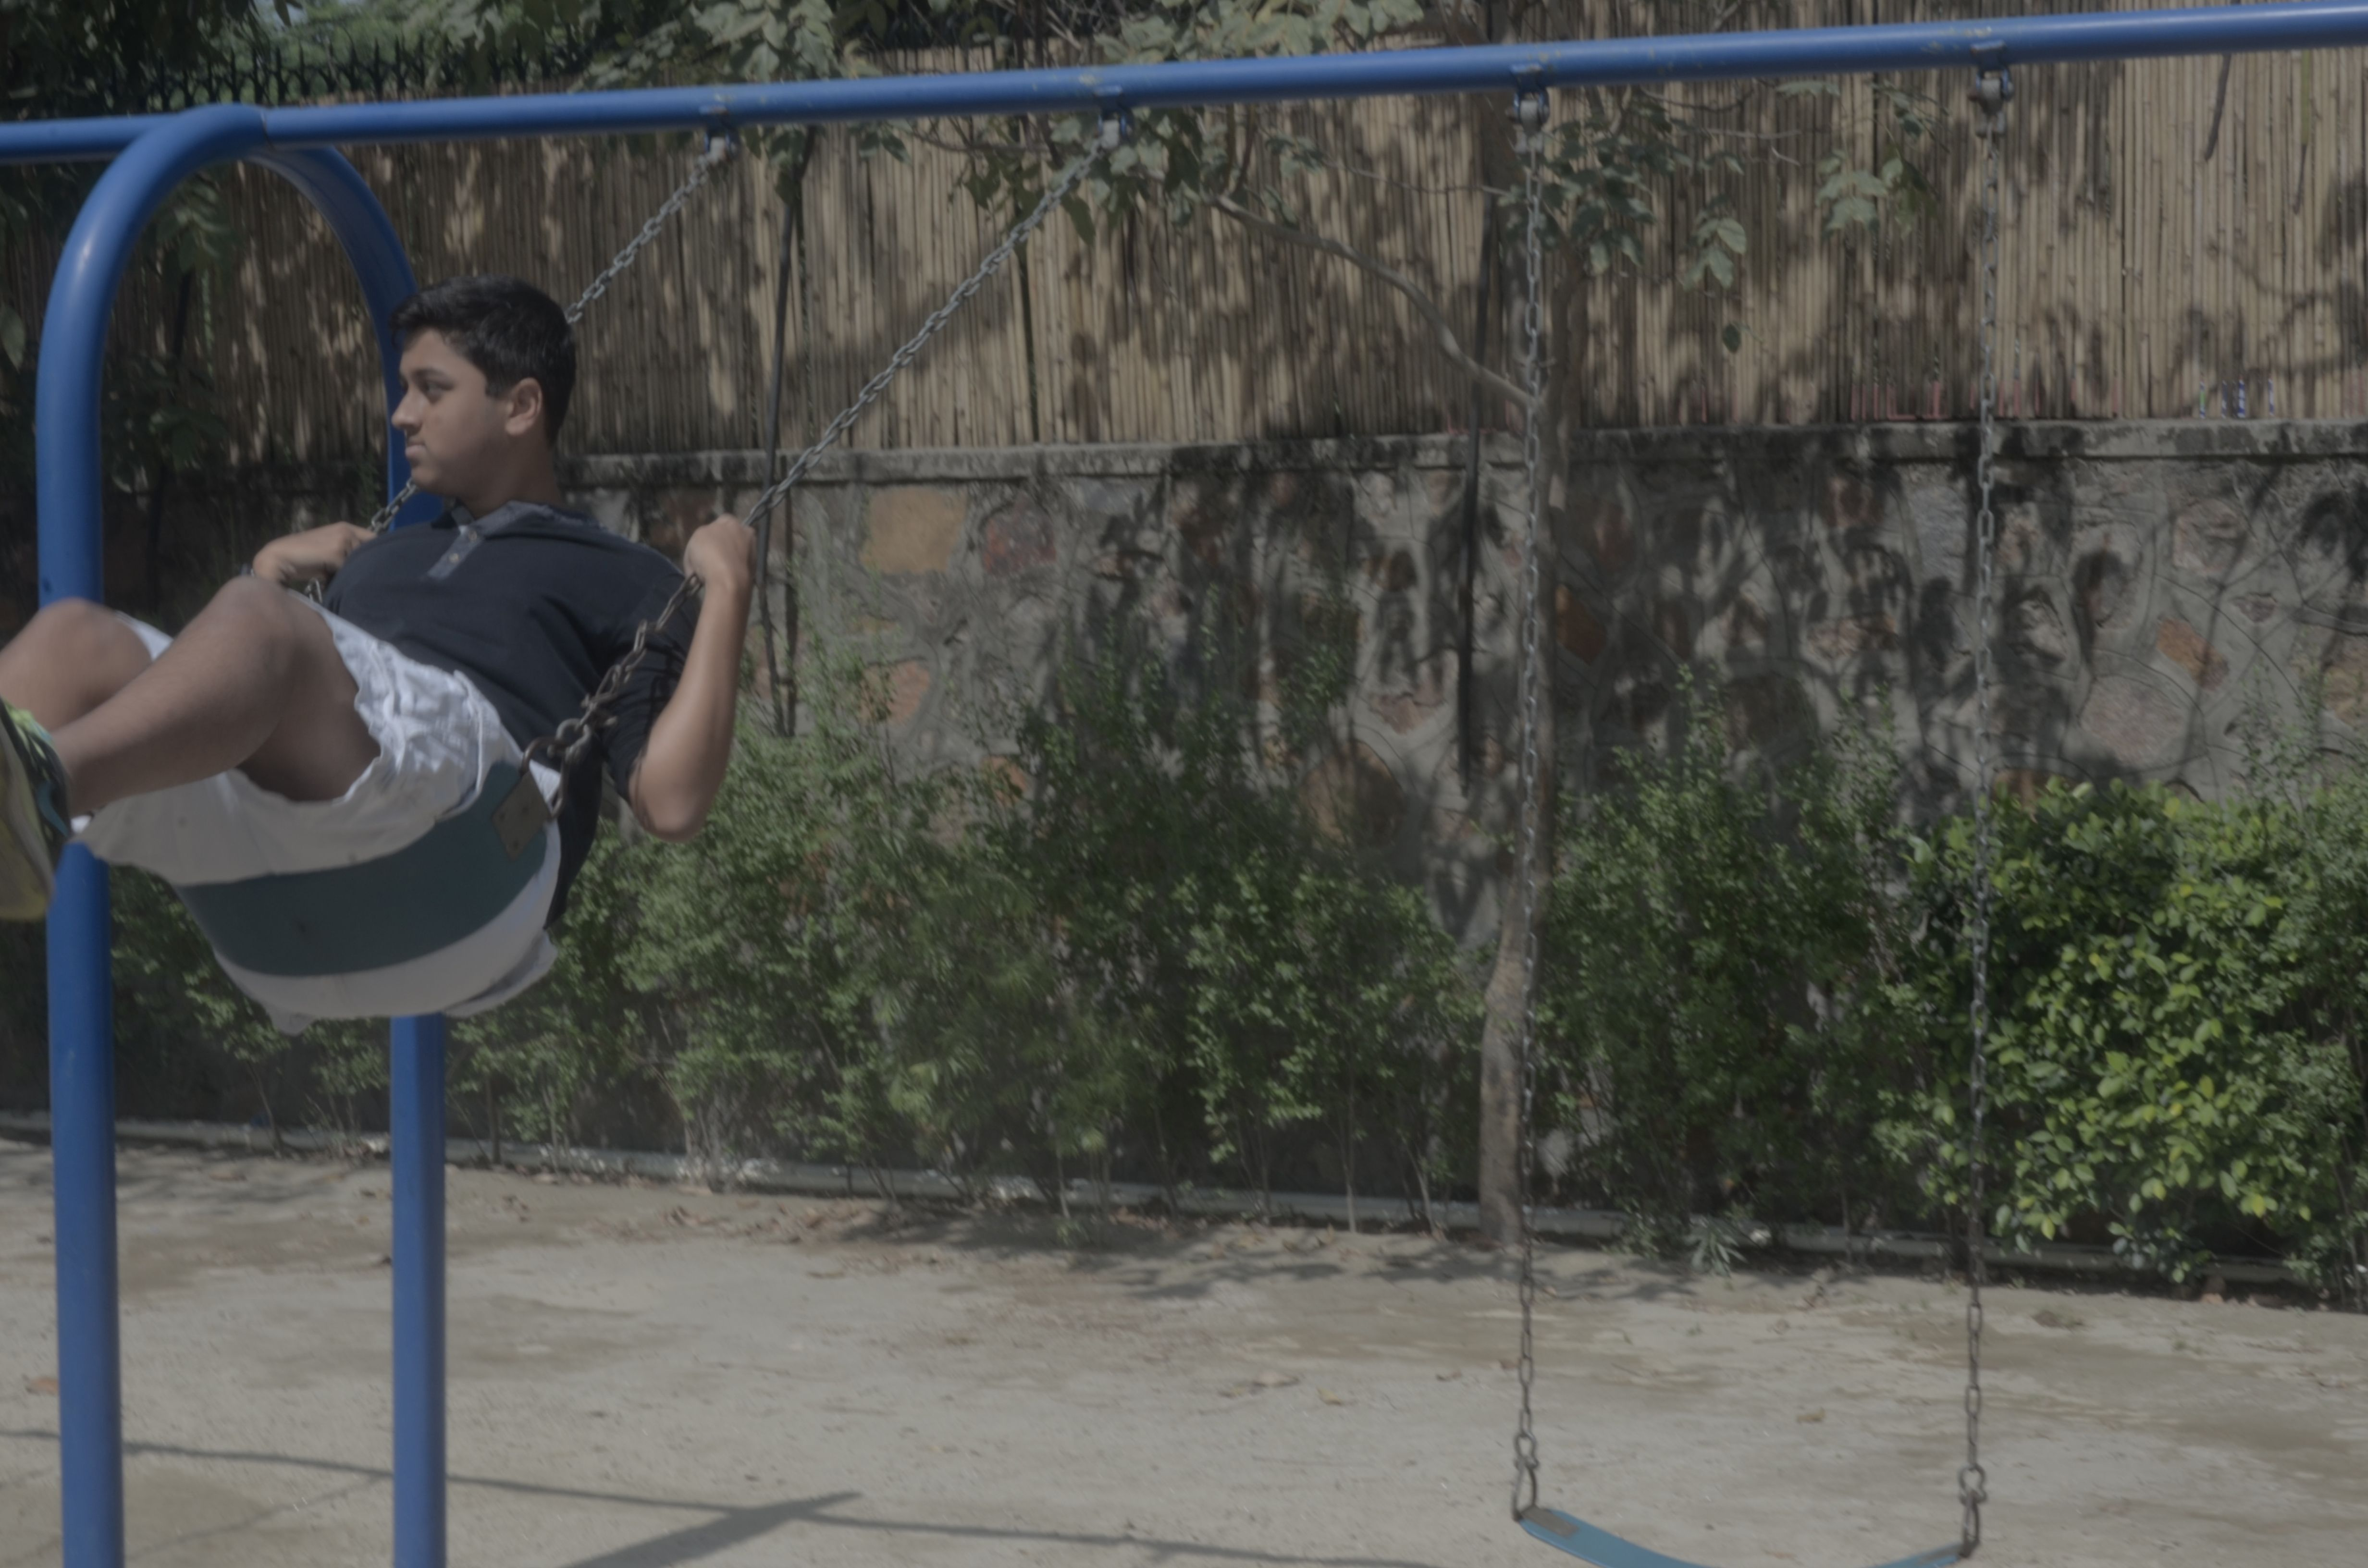 Nilay on the swings